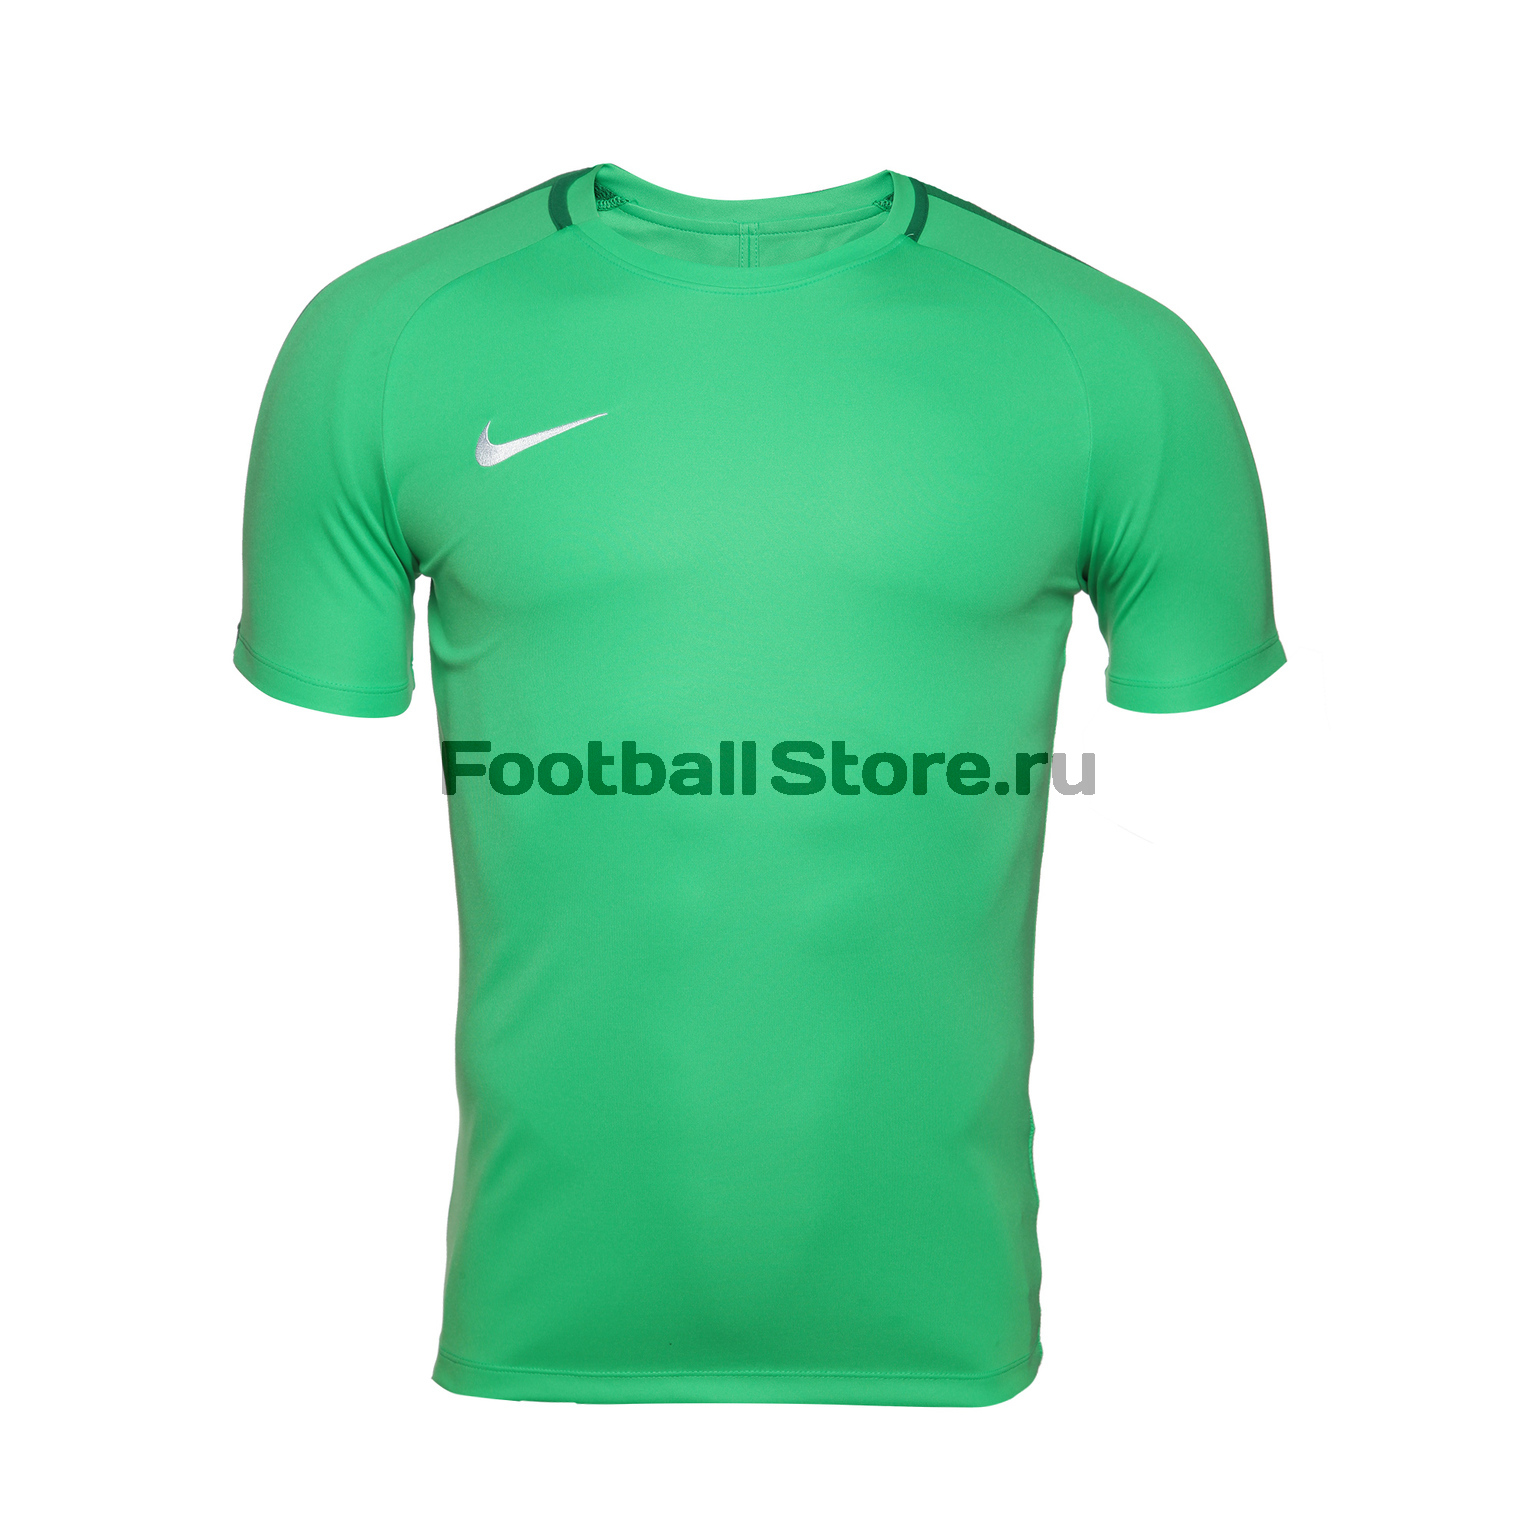 Футболка тренировочная Nike Dry Academy18 Top SS 893693-361